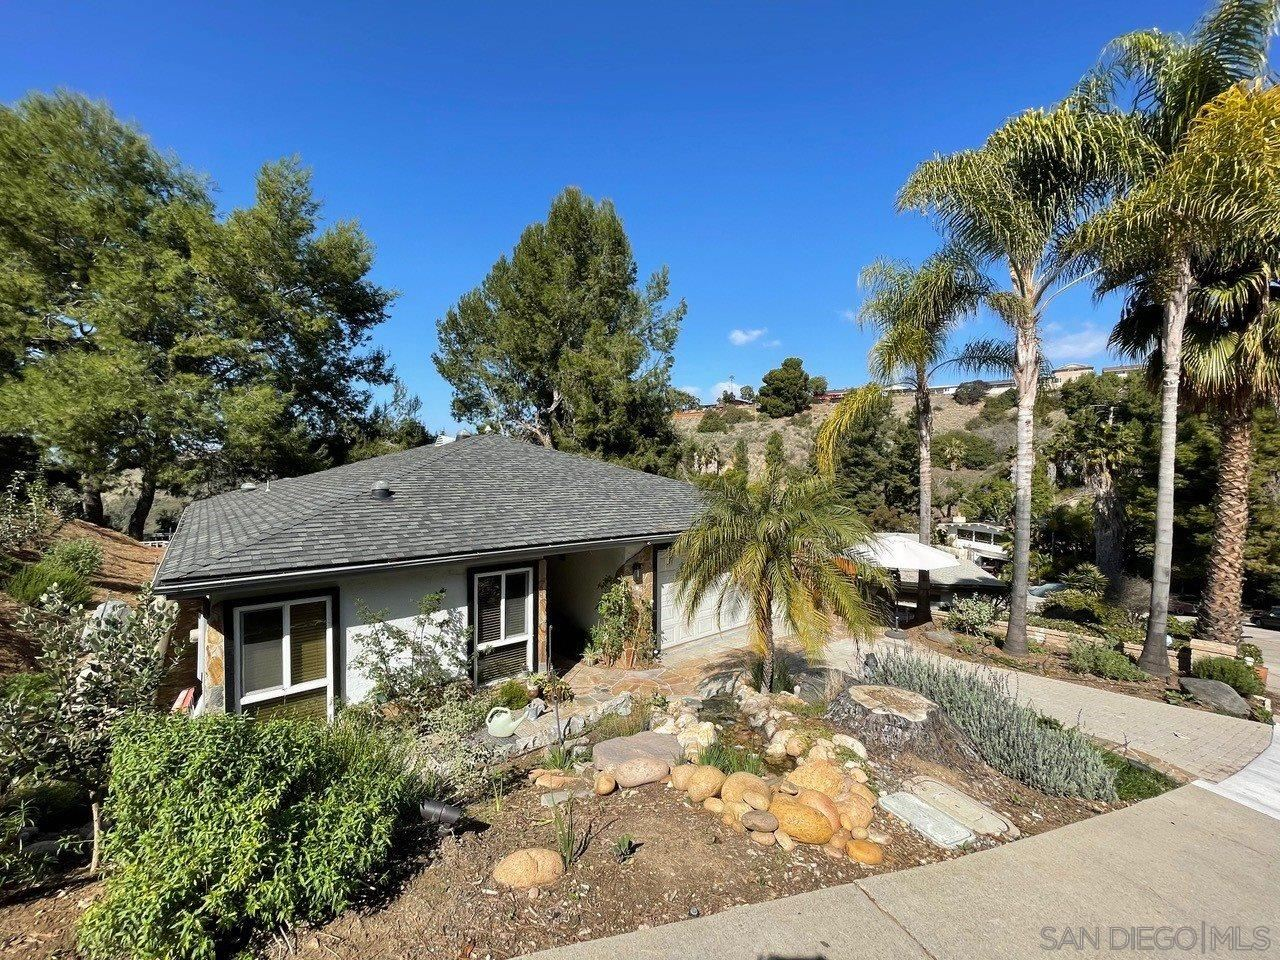 5640 Mill Peak Rd, San Diego, CA 92120 - #: 210004402